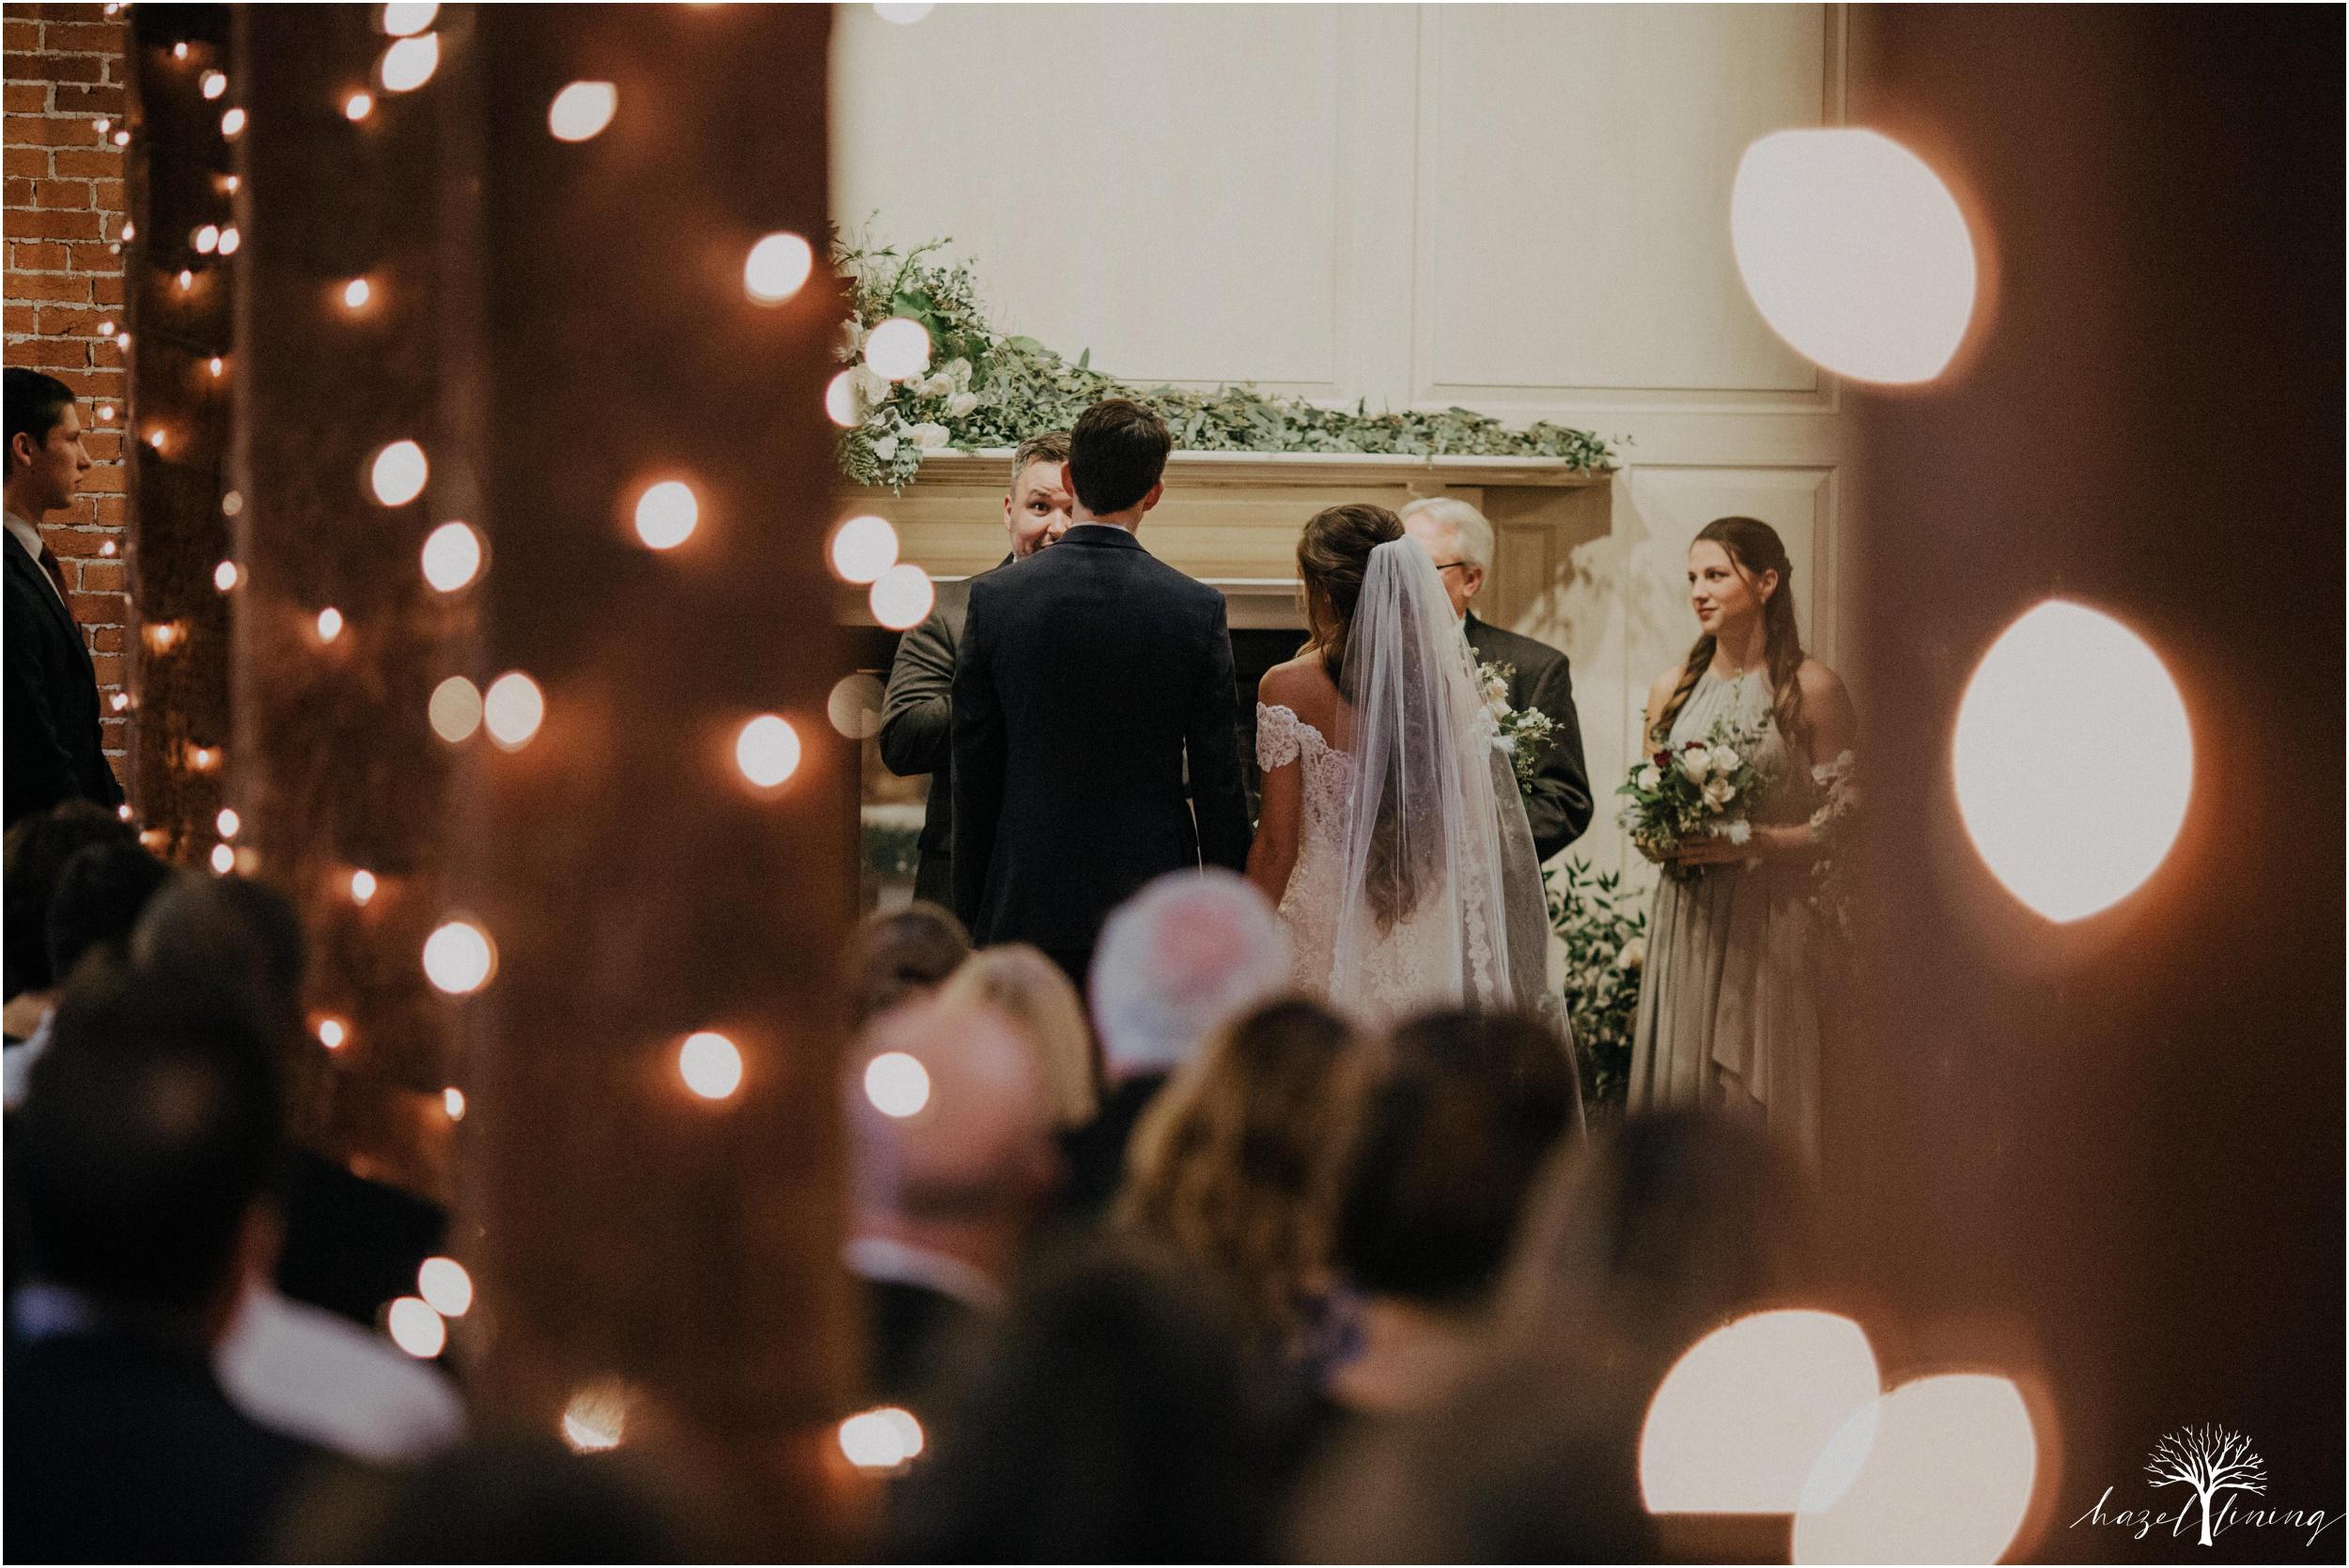 emma-matt-gehringer-the-booking-house-lancaster-manhiem-pennsylvania-winter-wedding_0058.jpg